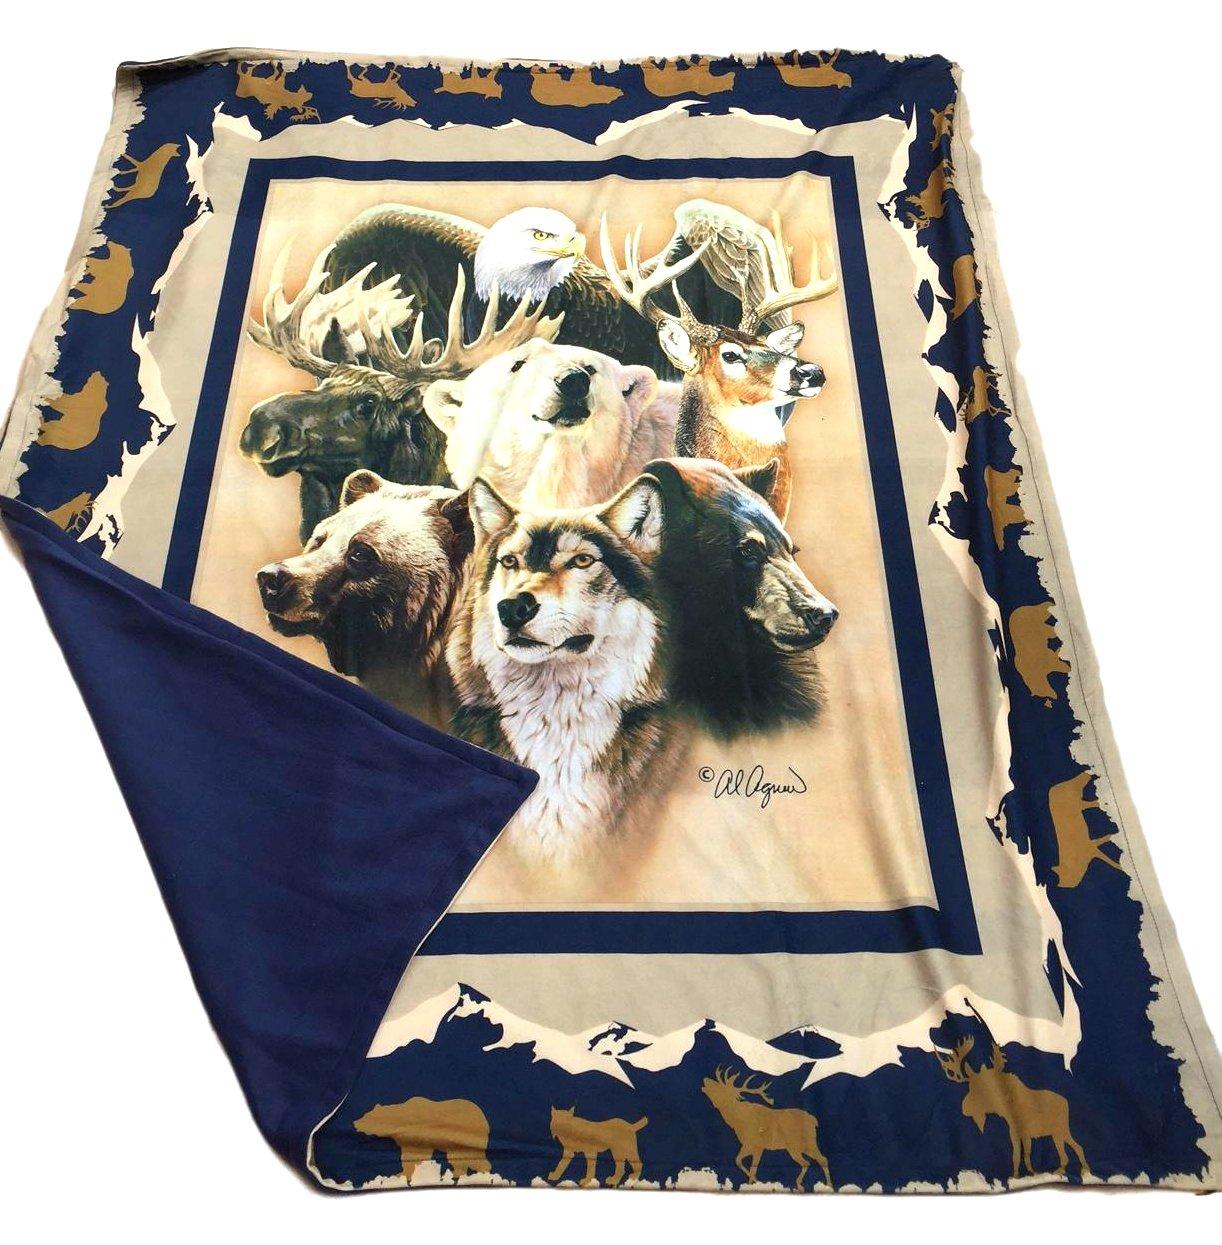 Animal Print Throw Blanket, Photoreal Printed Short Fur Throws with Fleece Reverse, Wildlife Theme, 50 x 60